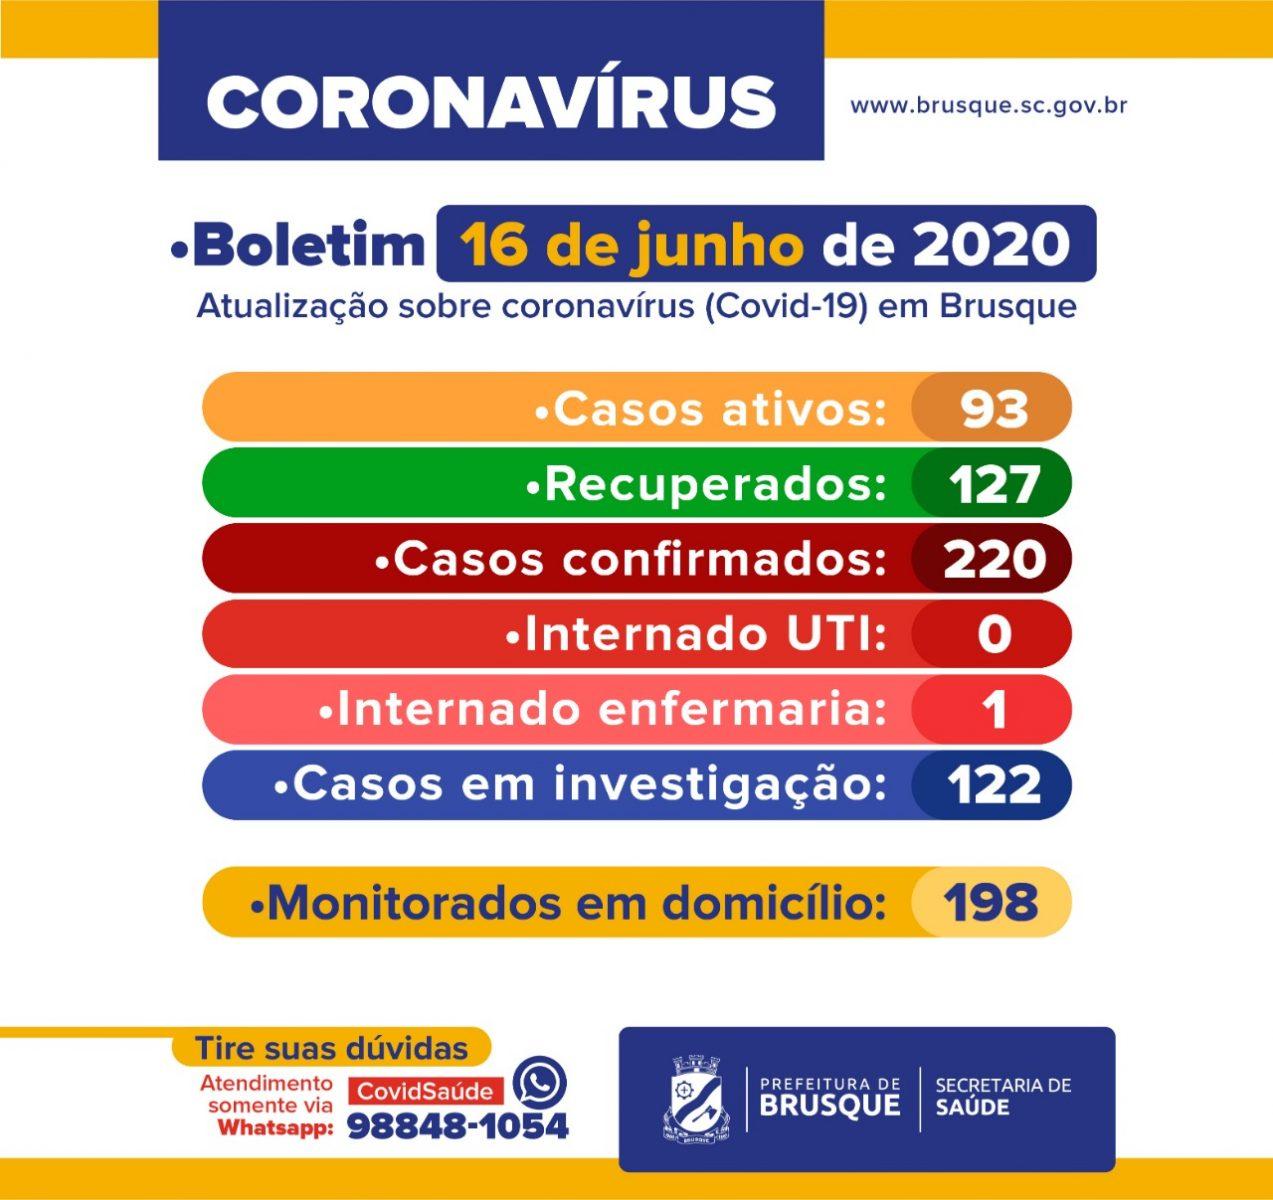 Confira o Boletim Epidemiológico da Prefeitura de Brusque desta terça-feira (16)